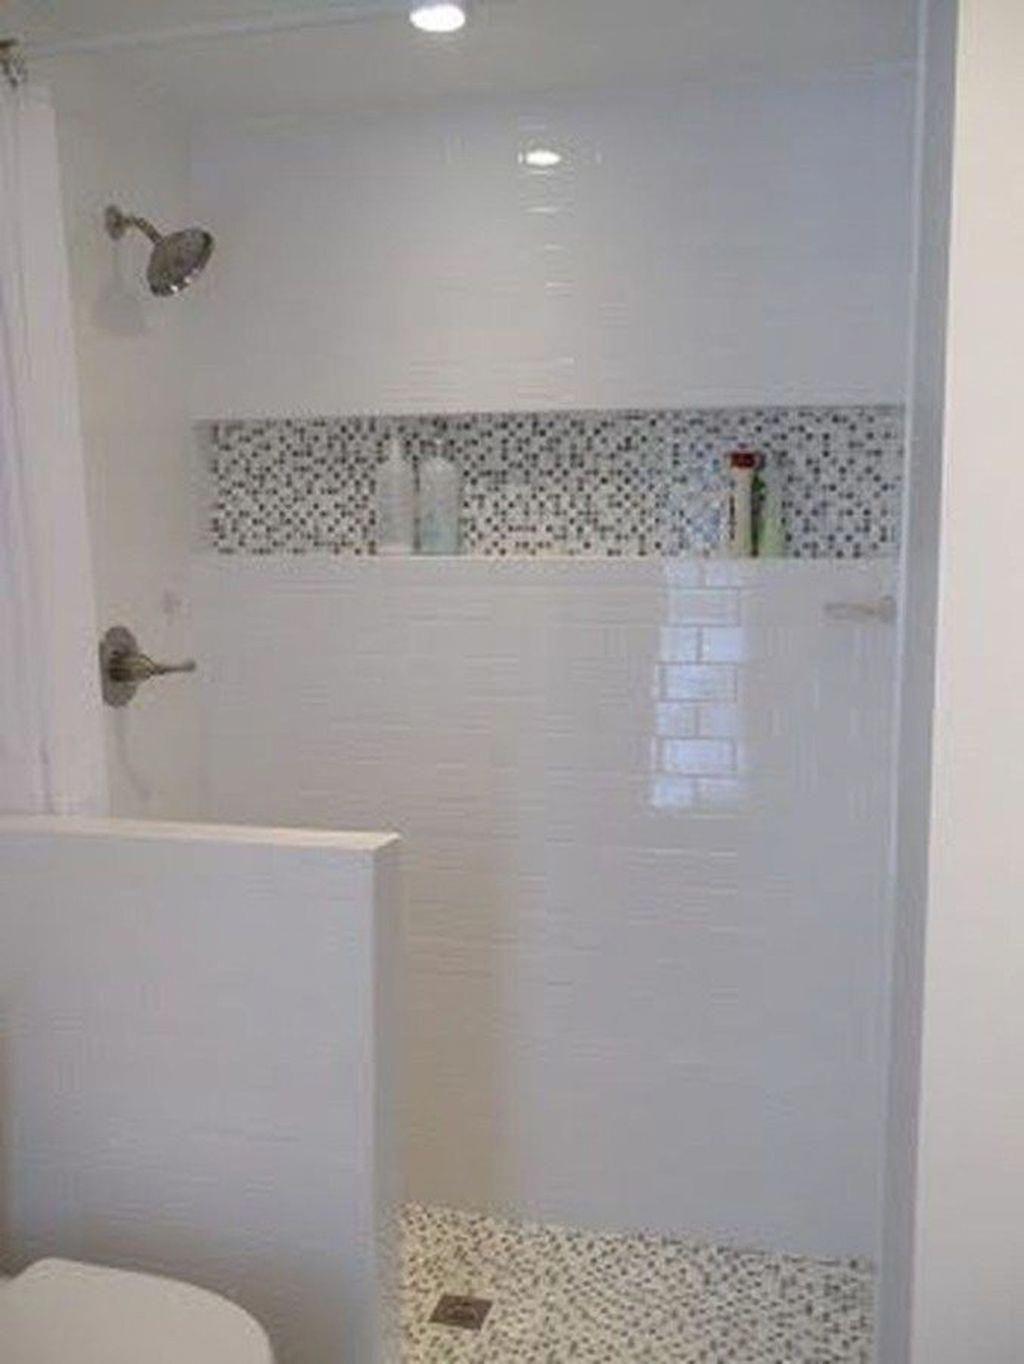 What Color Bathroom Fixtures Are In Style Bathroomremodelhomedepot Bathroomcolorsche Minimalist Small Bathrooms Bathroom Remodel Designs Diy Bathroom Remodel